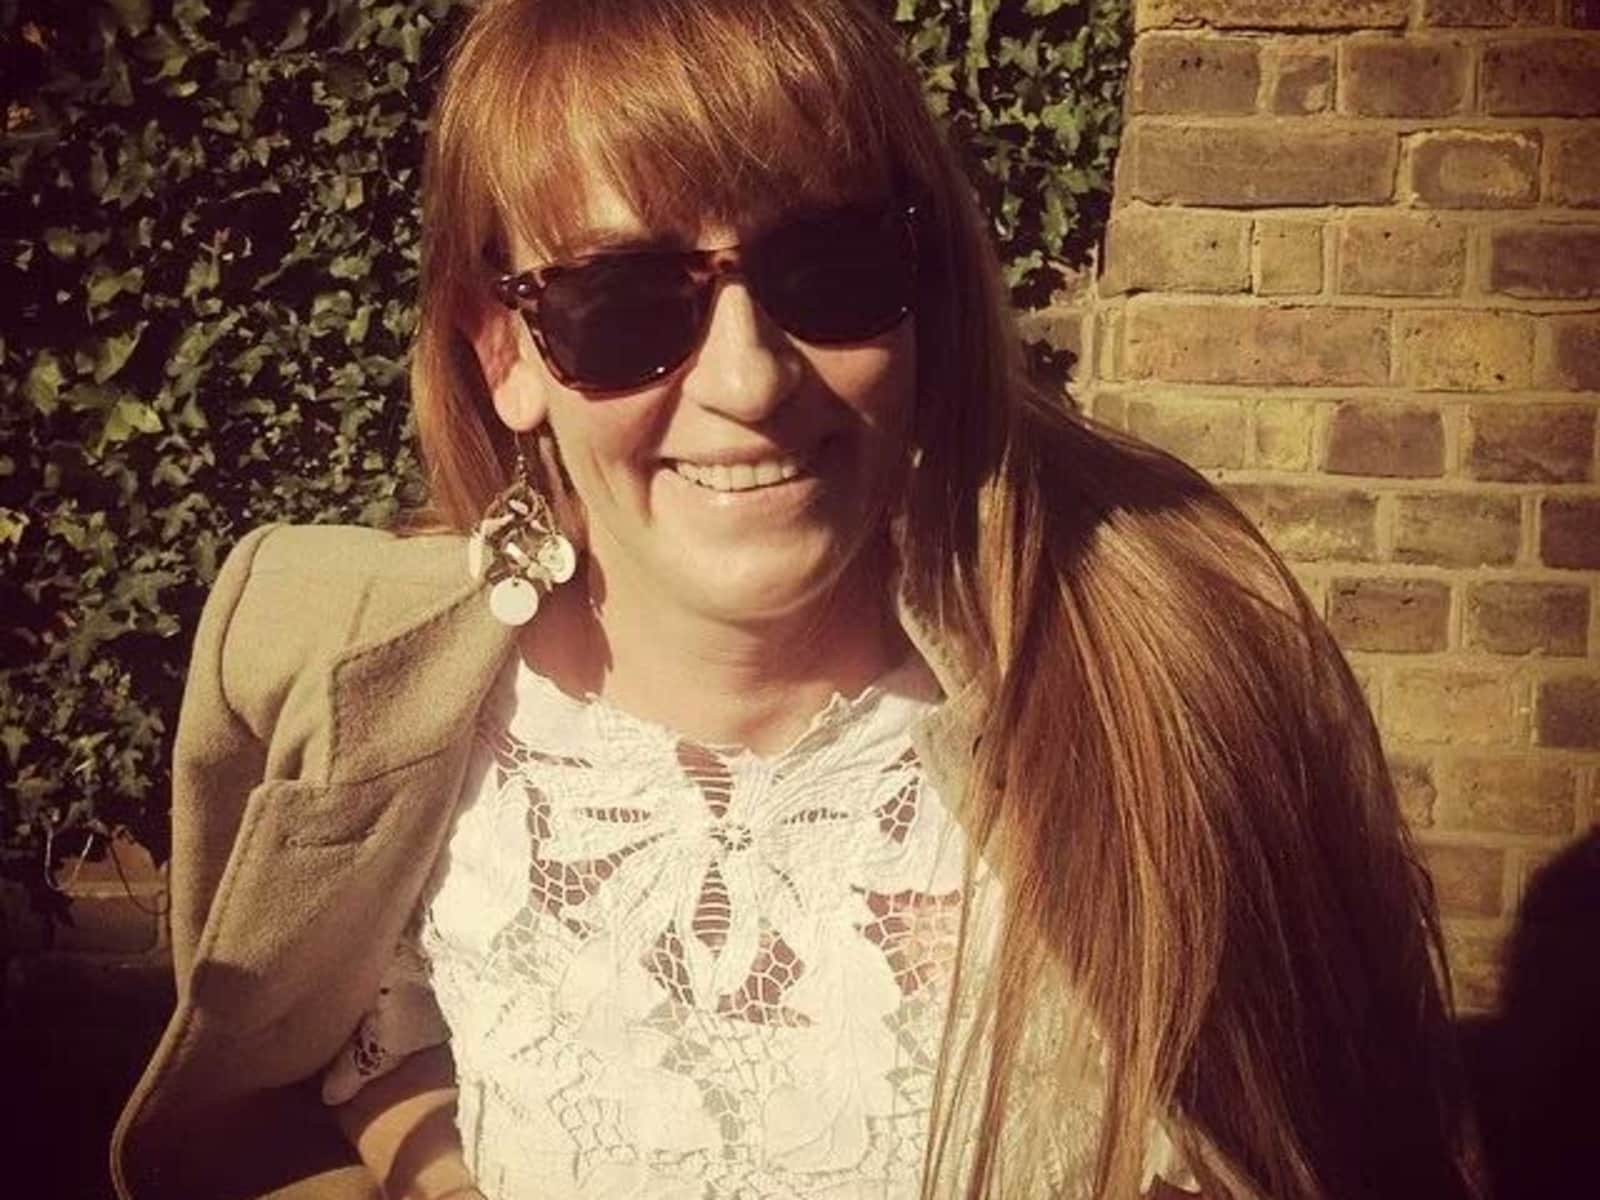 Rebecca from London, United Kingdom